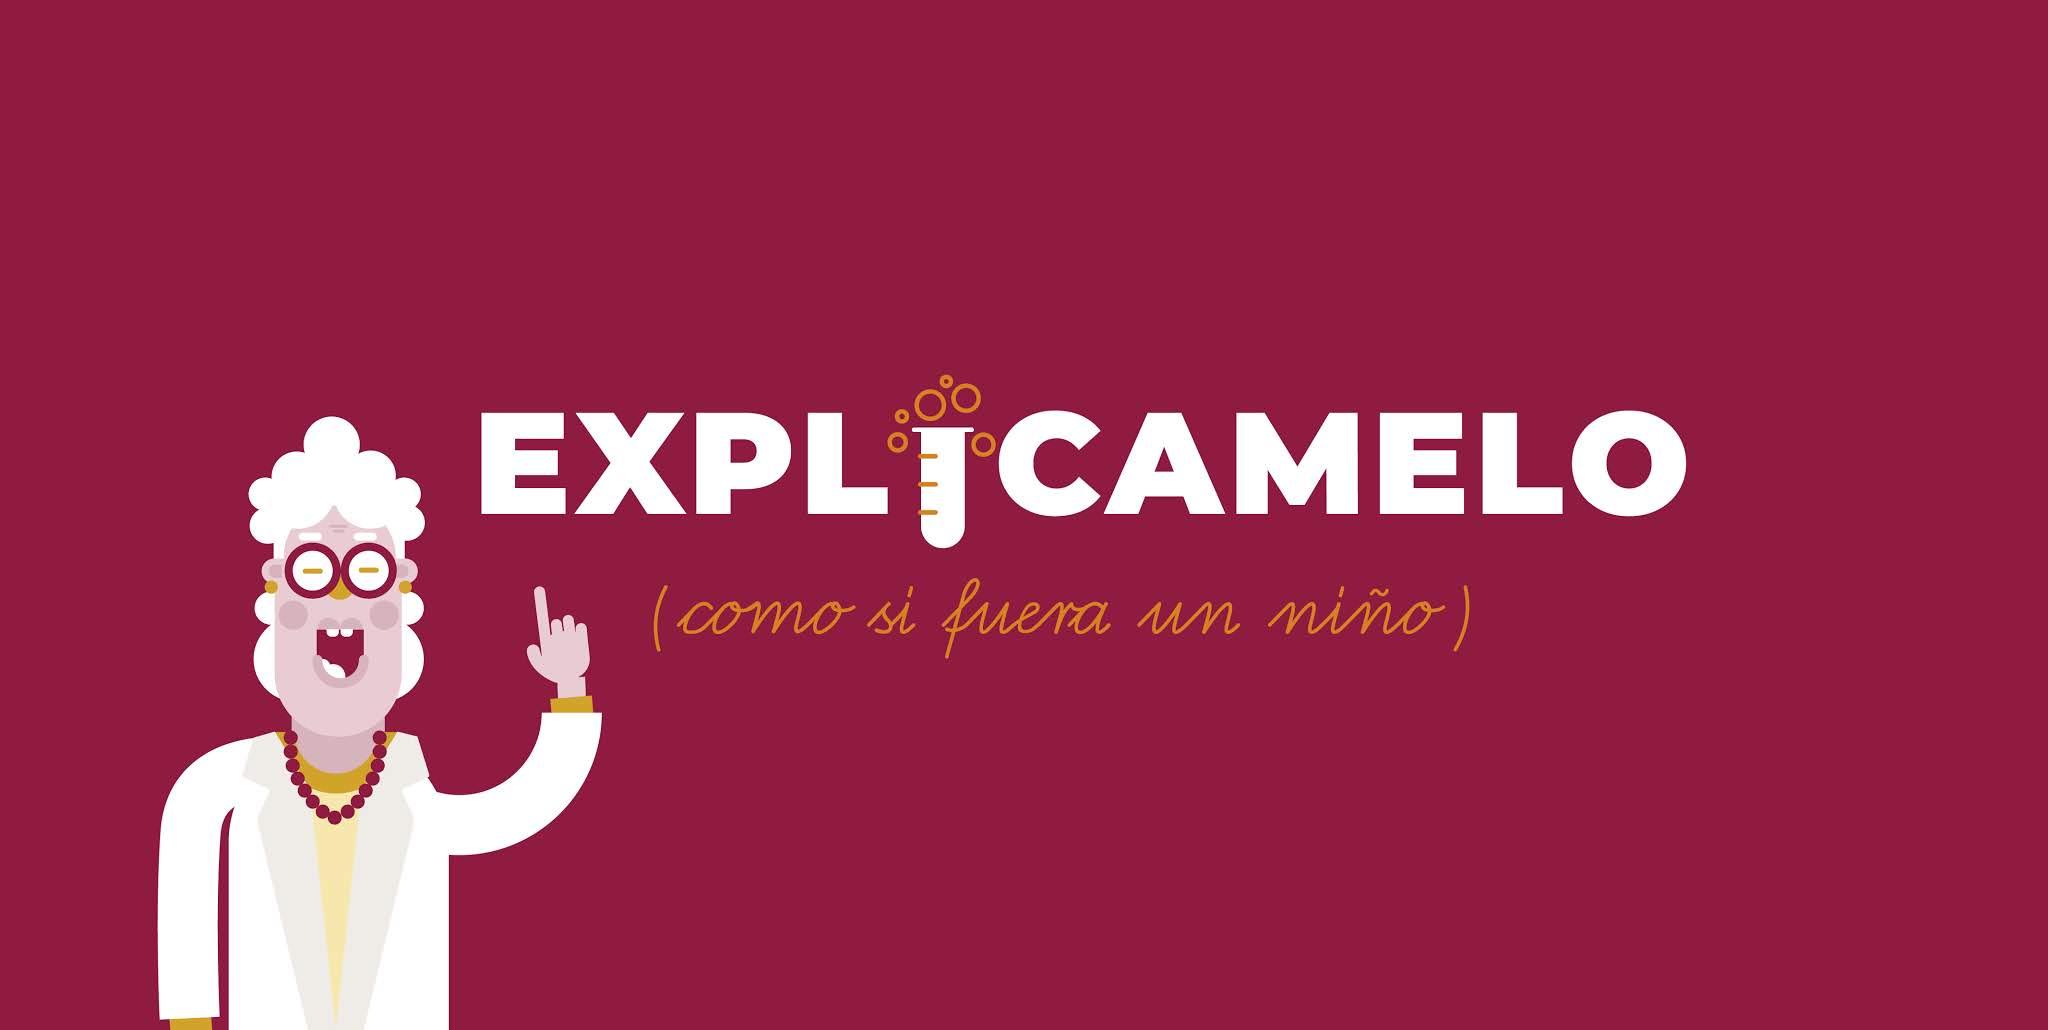 Premis Rei Jaume I_Explícamelo (como si fuera un niño)